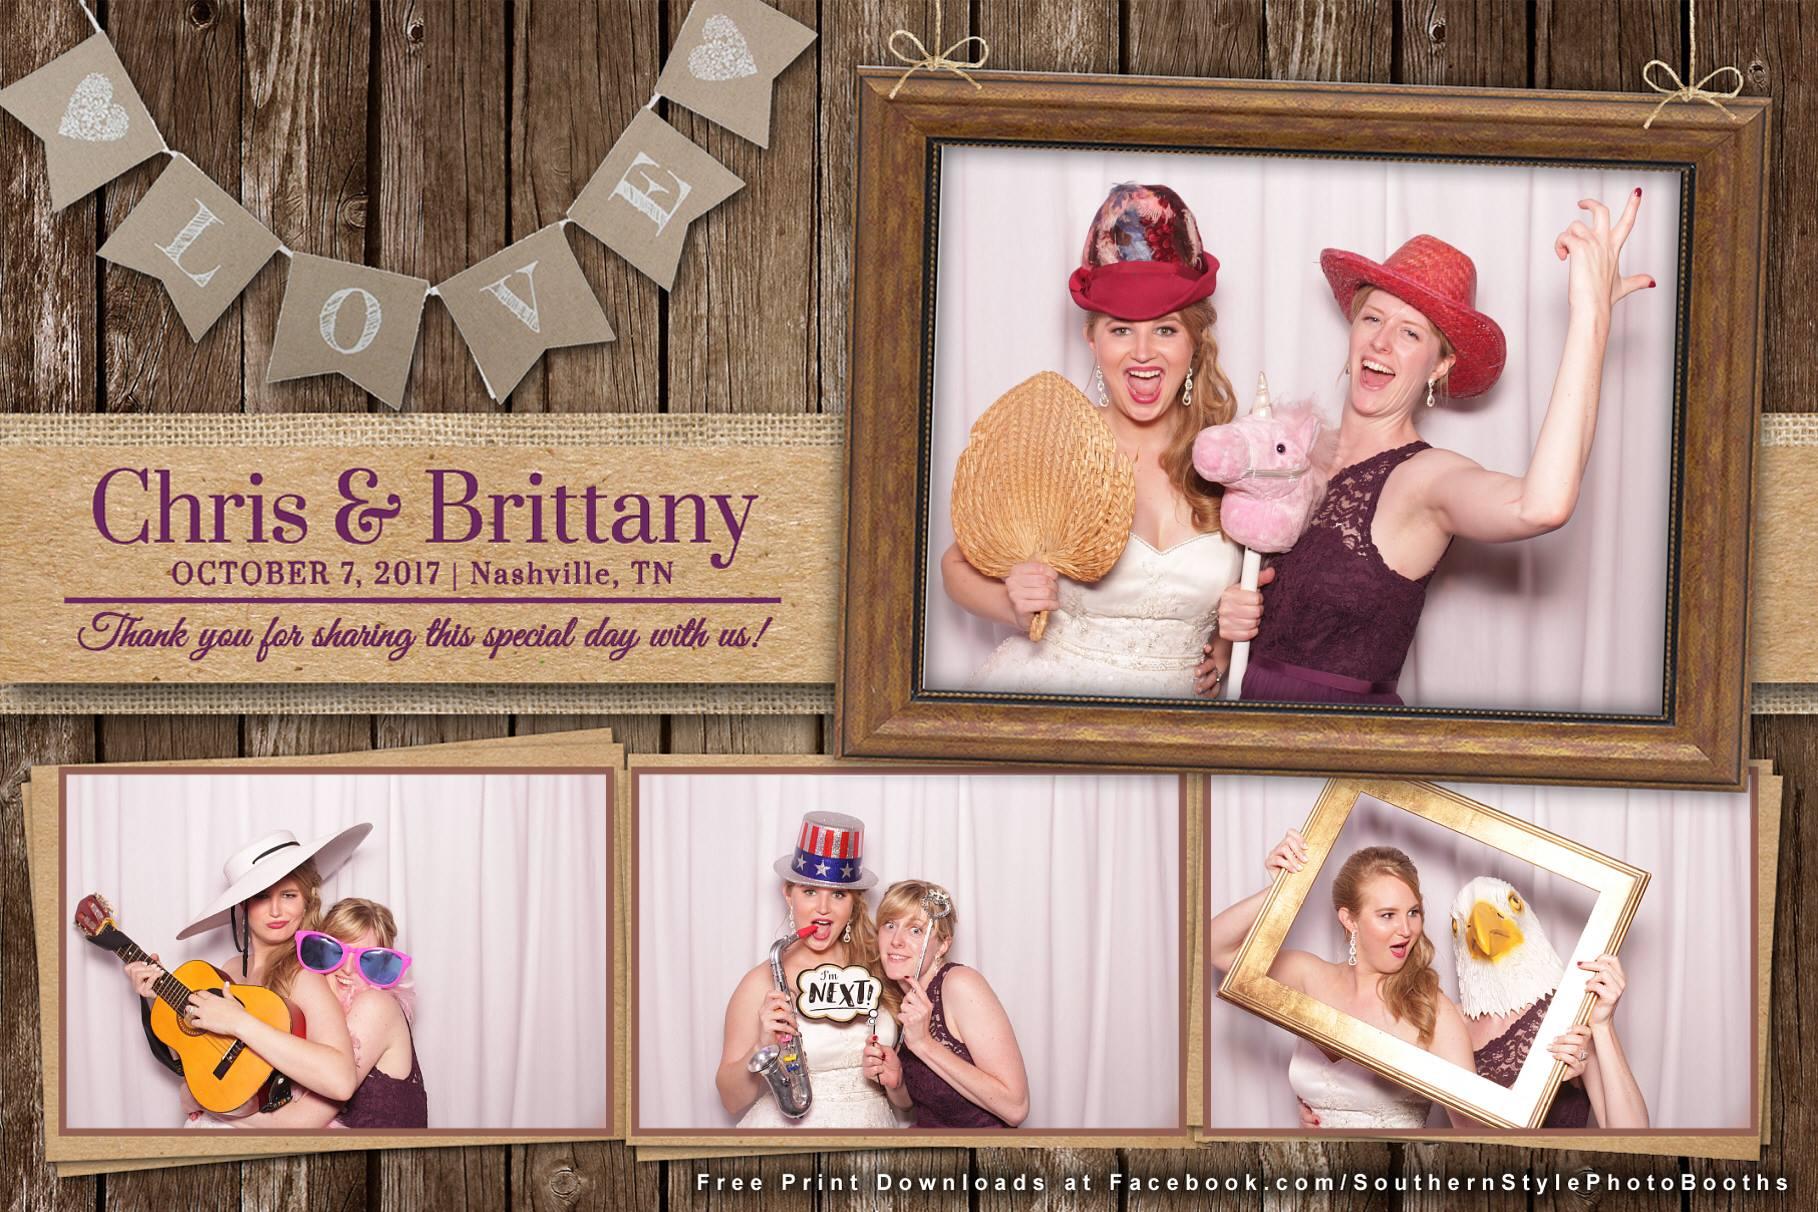 Chris & Brittany